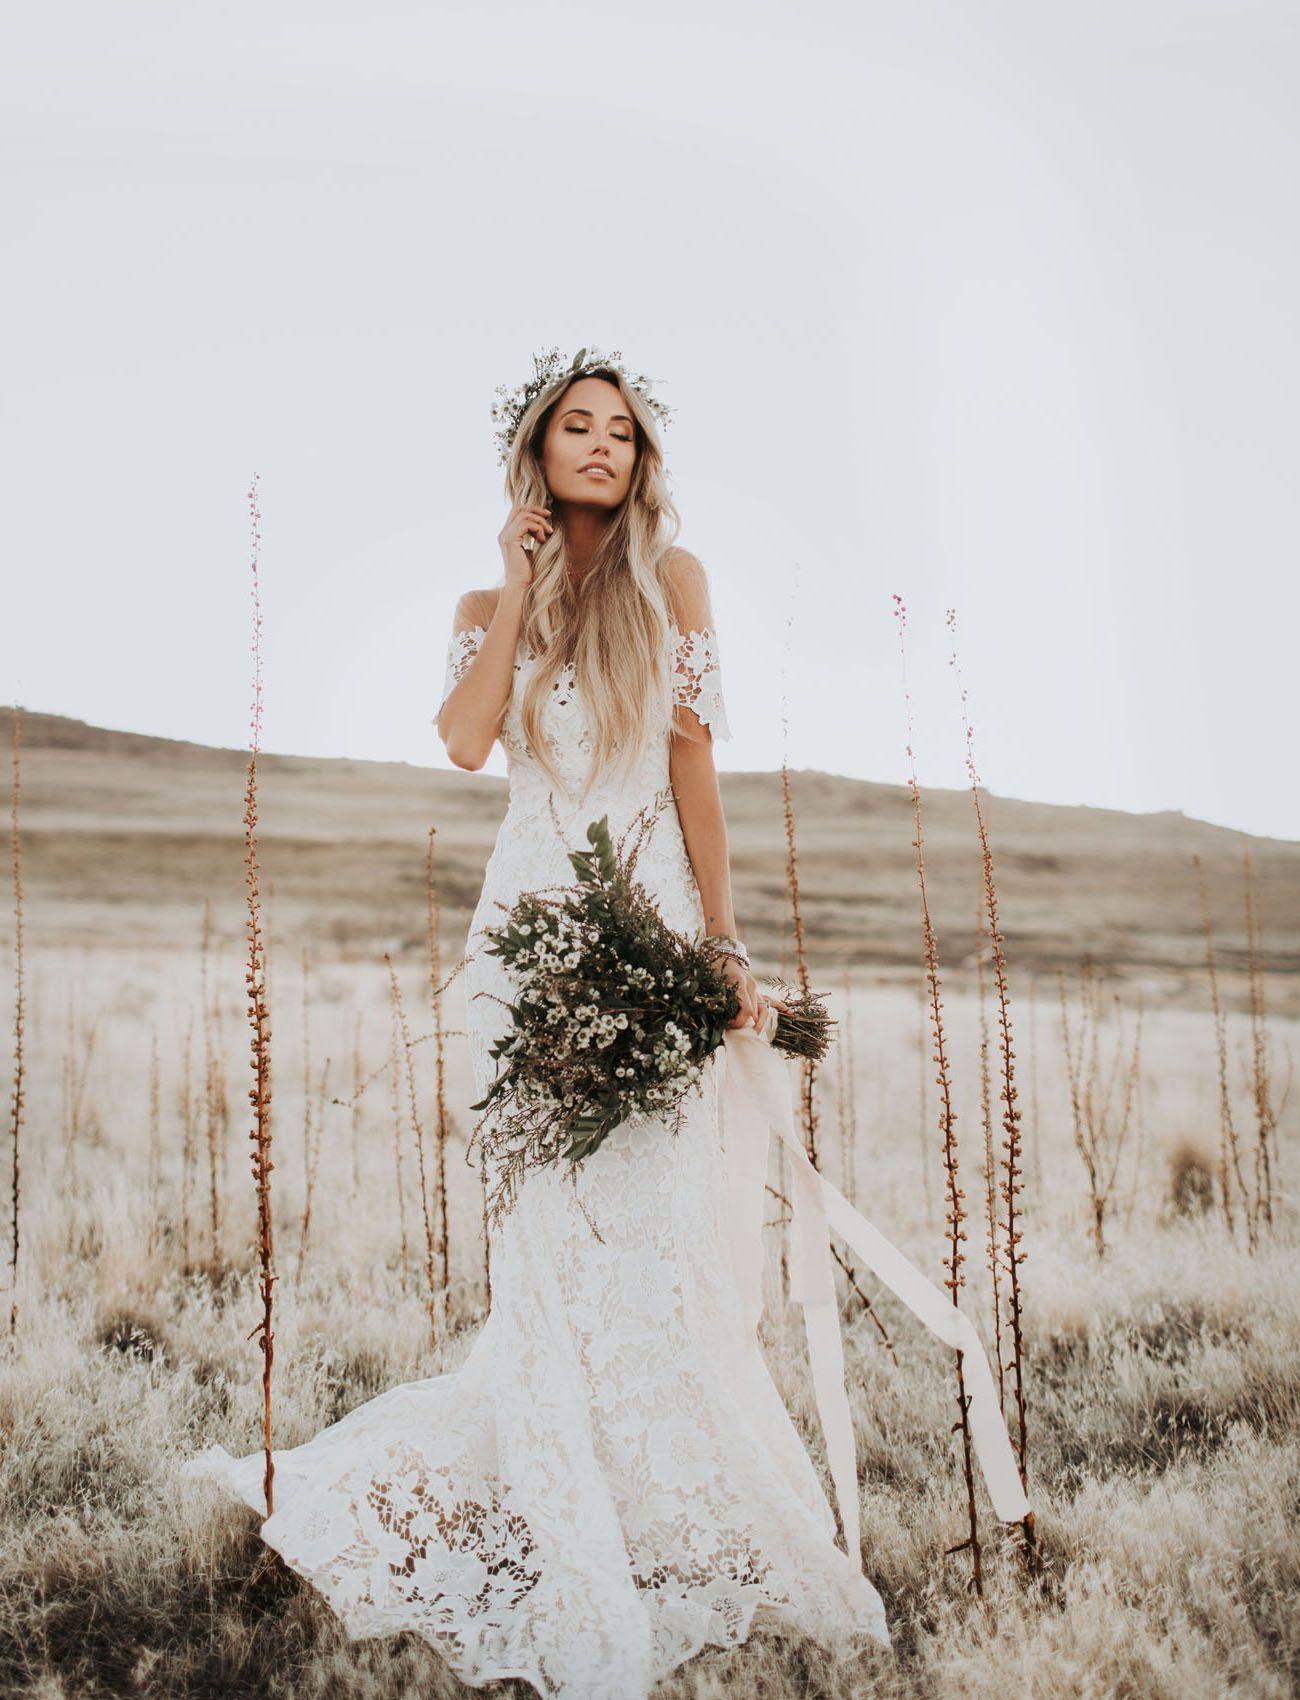 Gws lovers society collection boho lace wedding dress meg legs